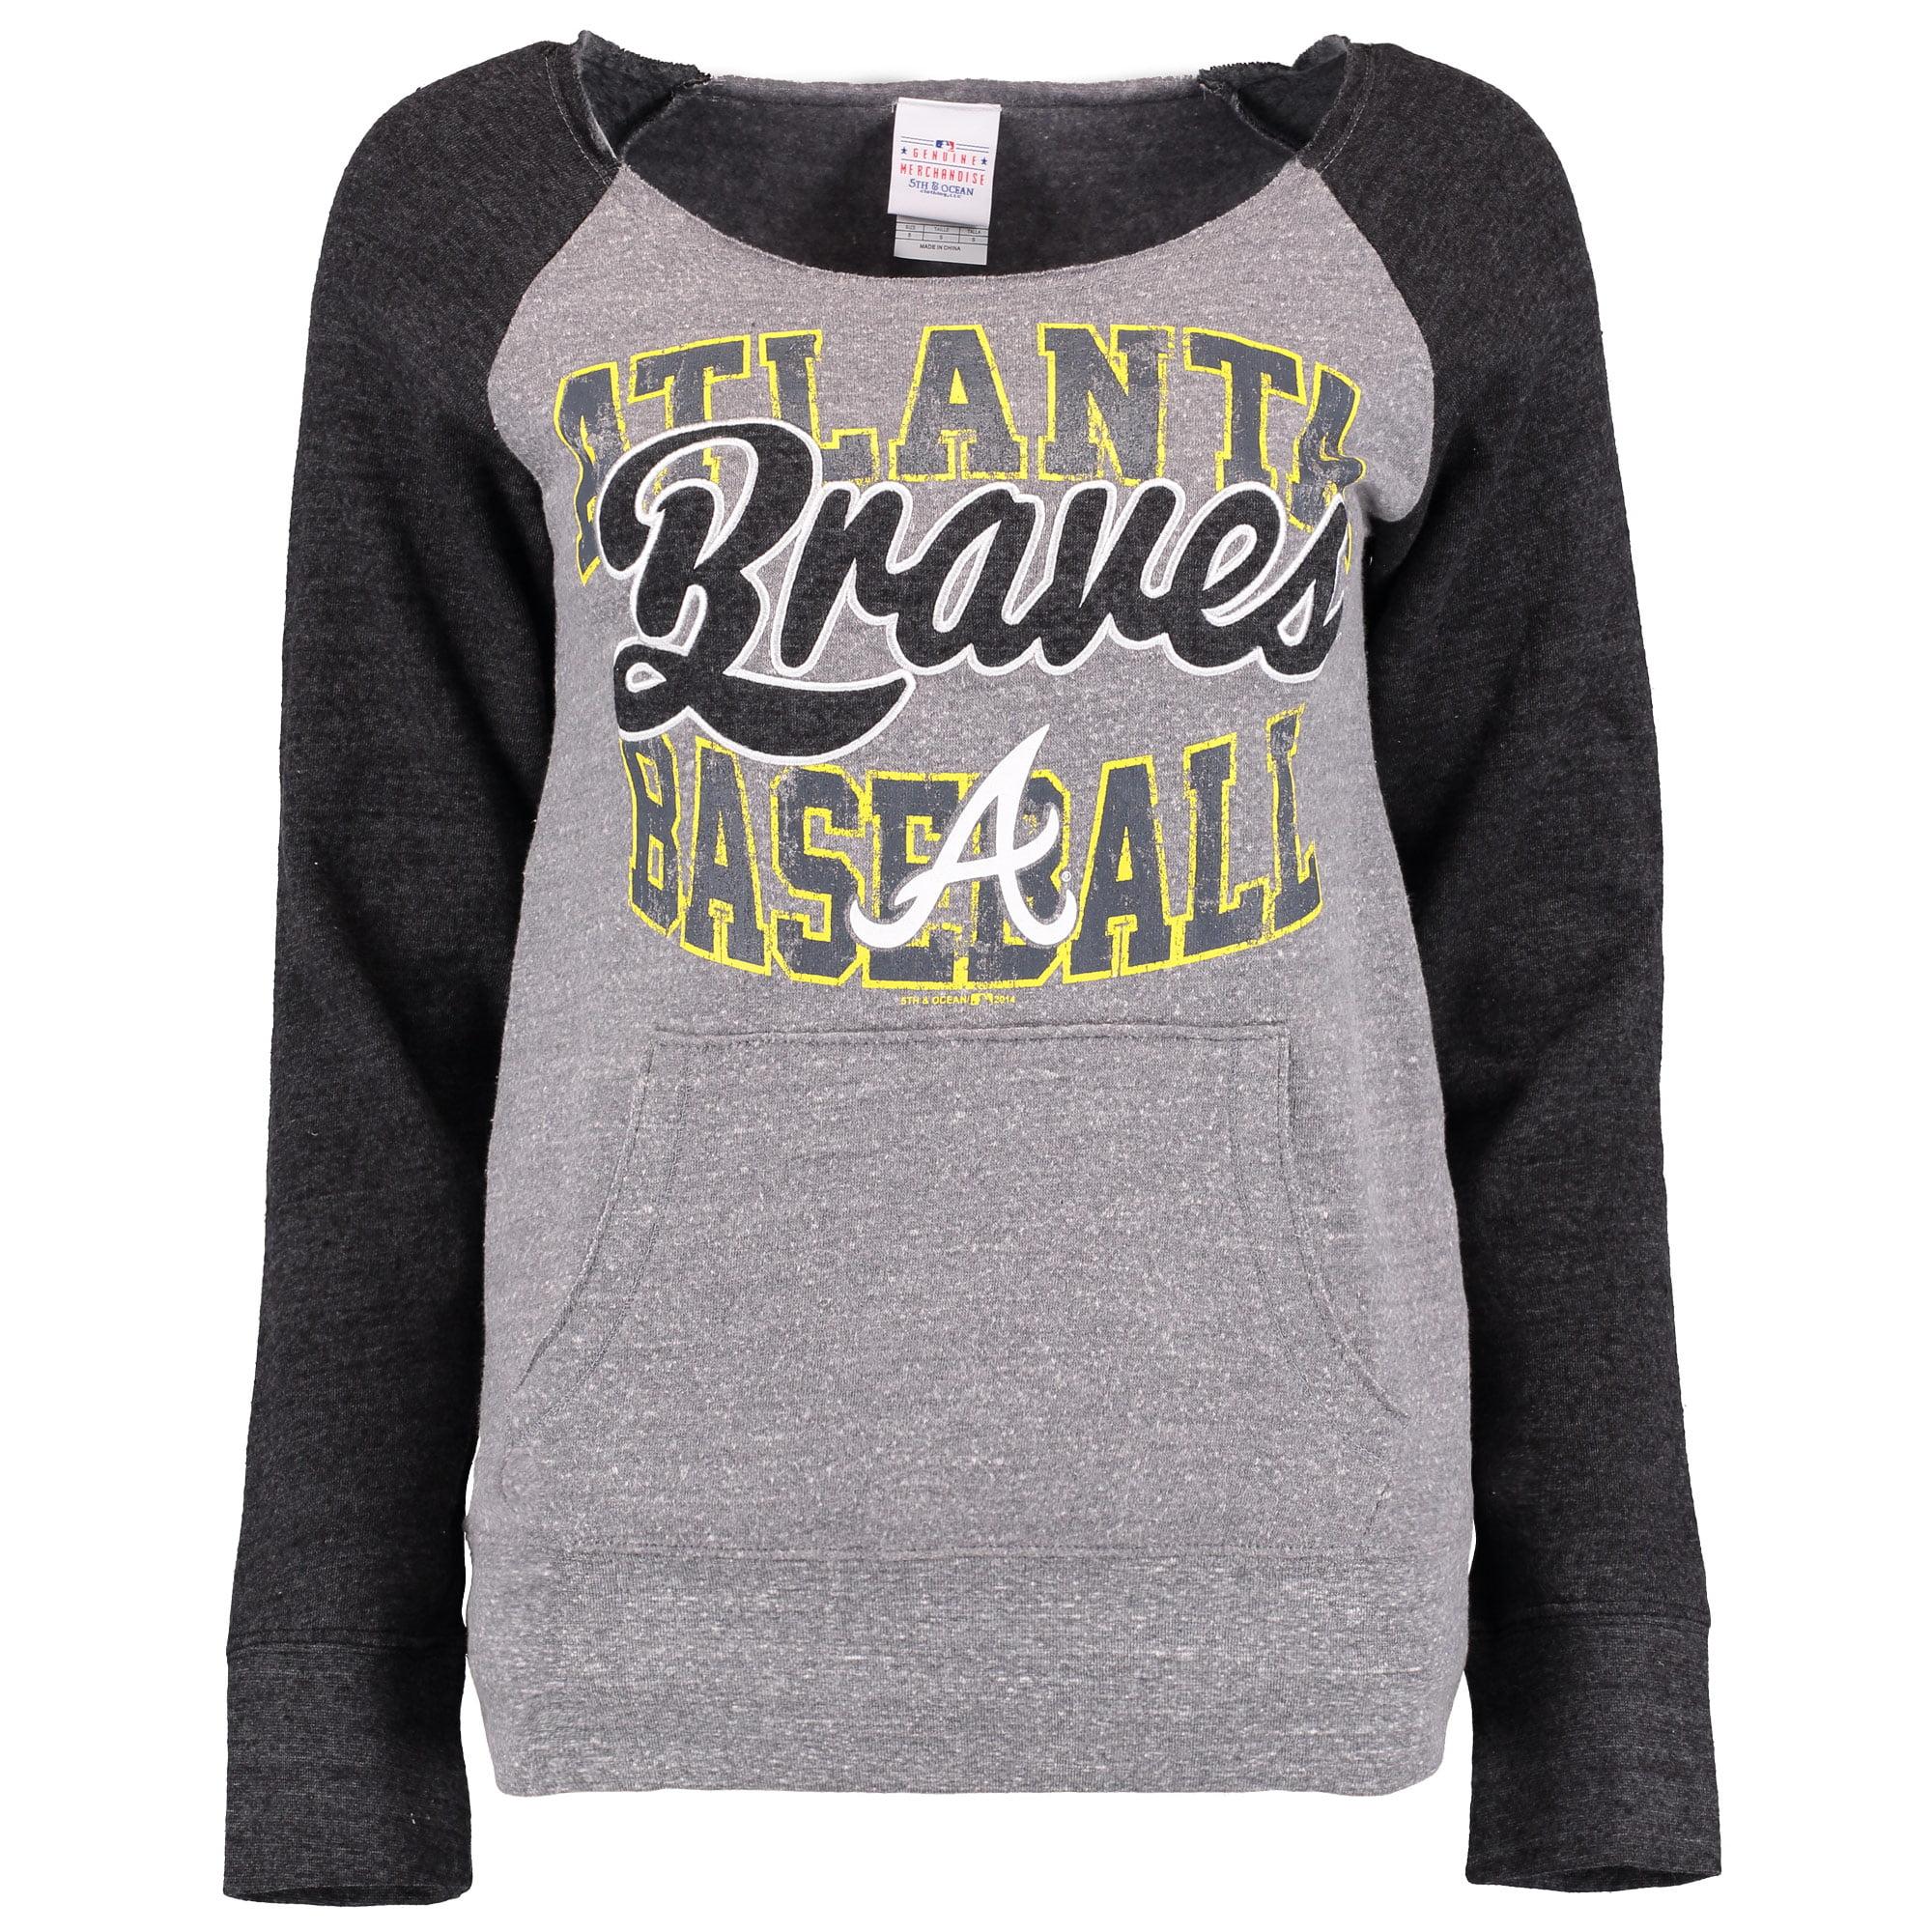 Atlanta Braves 5th & Ocean by New Era Women's Neon Tri-Blend Sweatshirt - Heather Grey